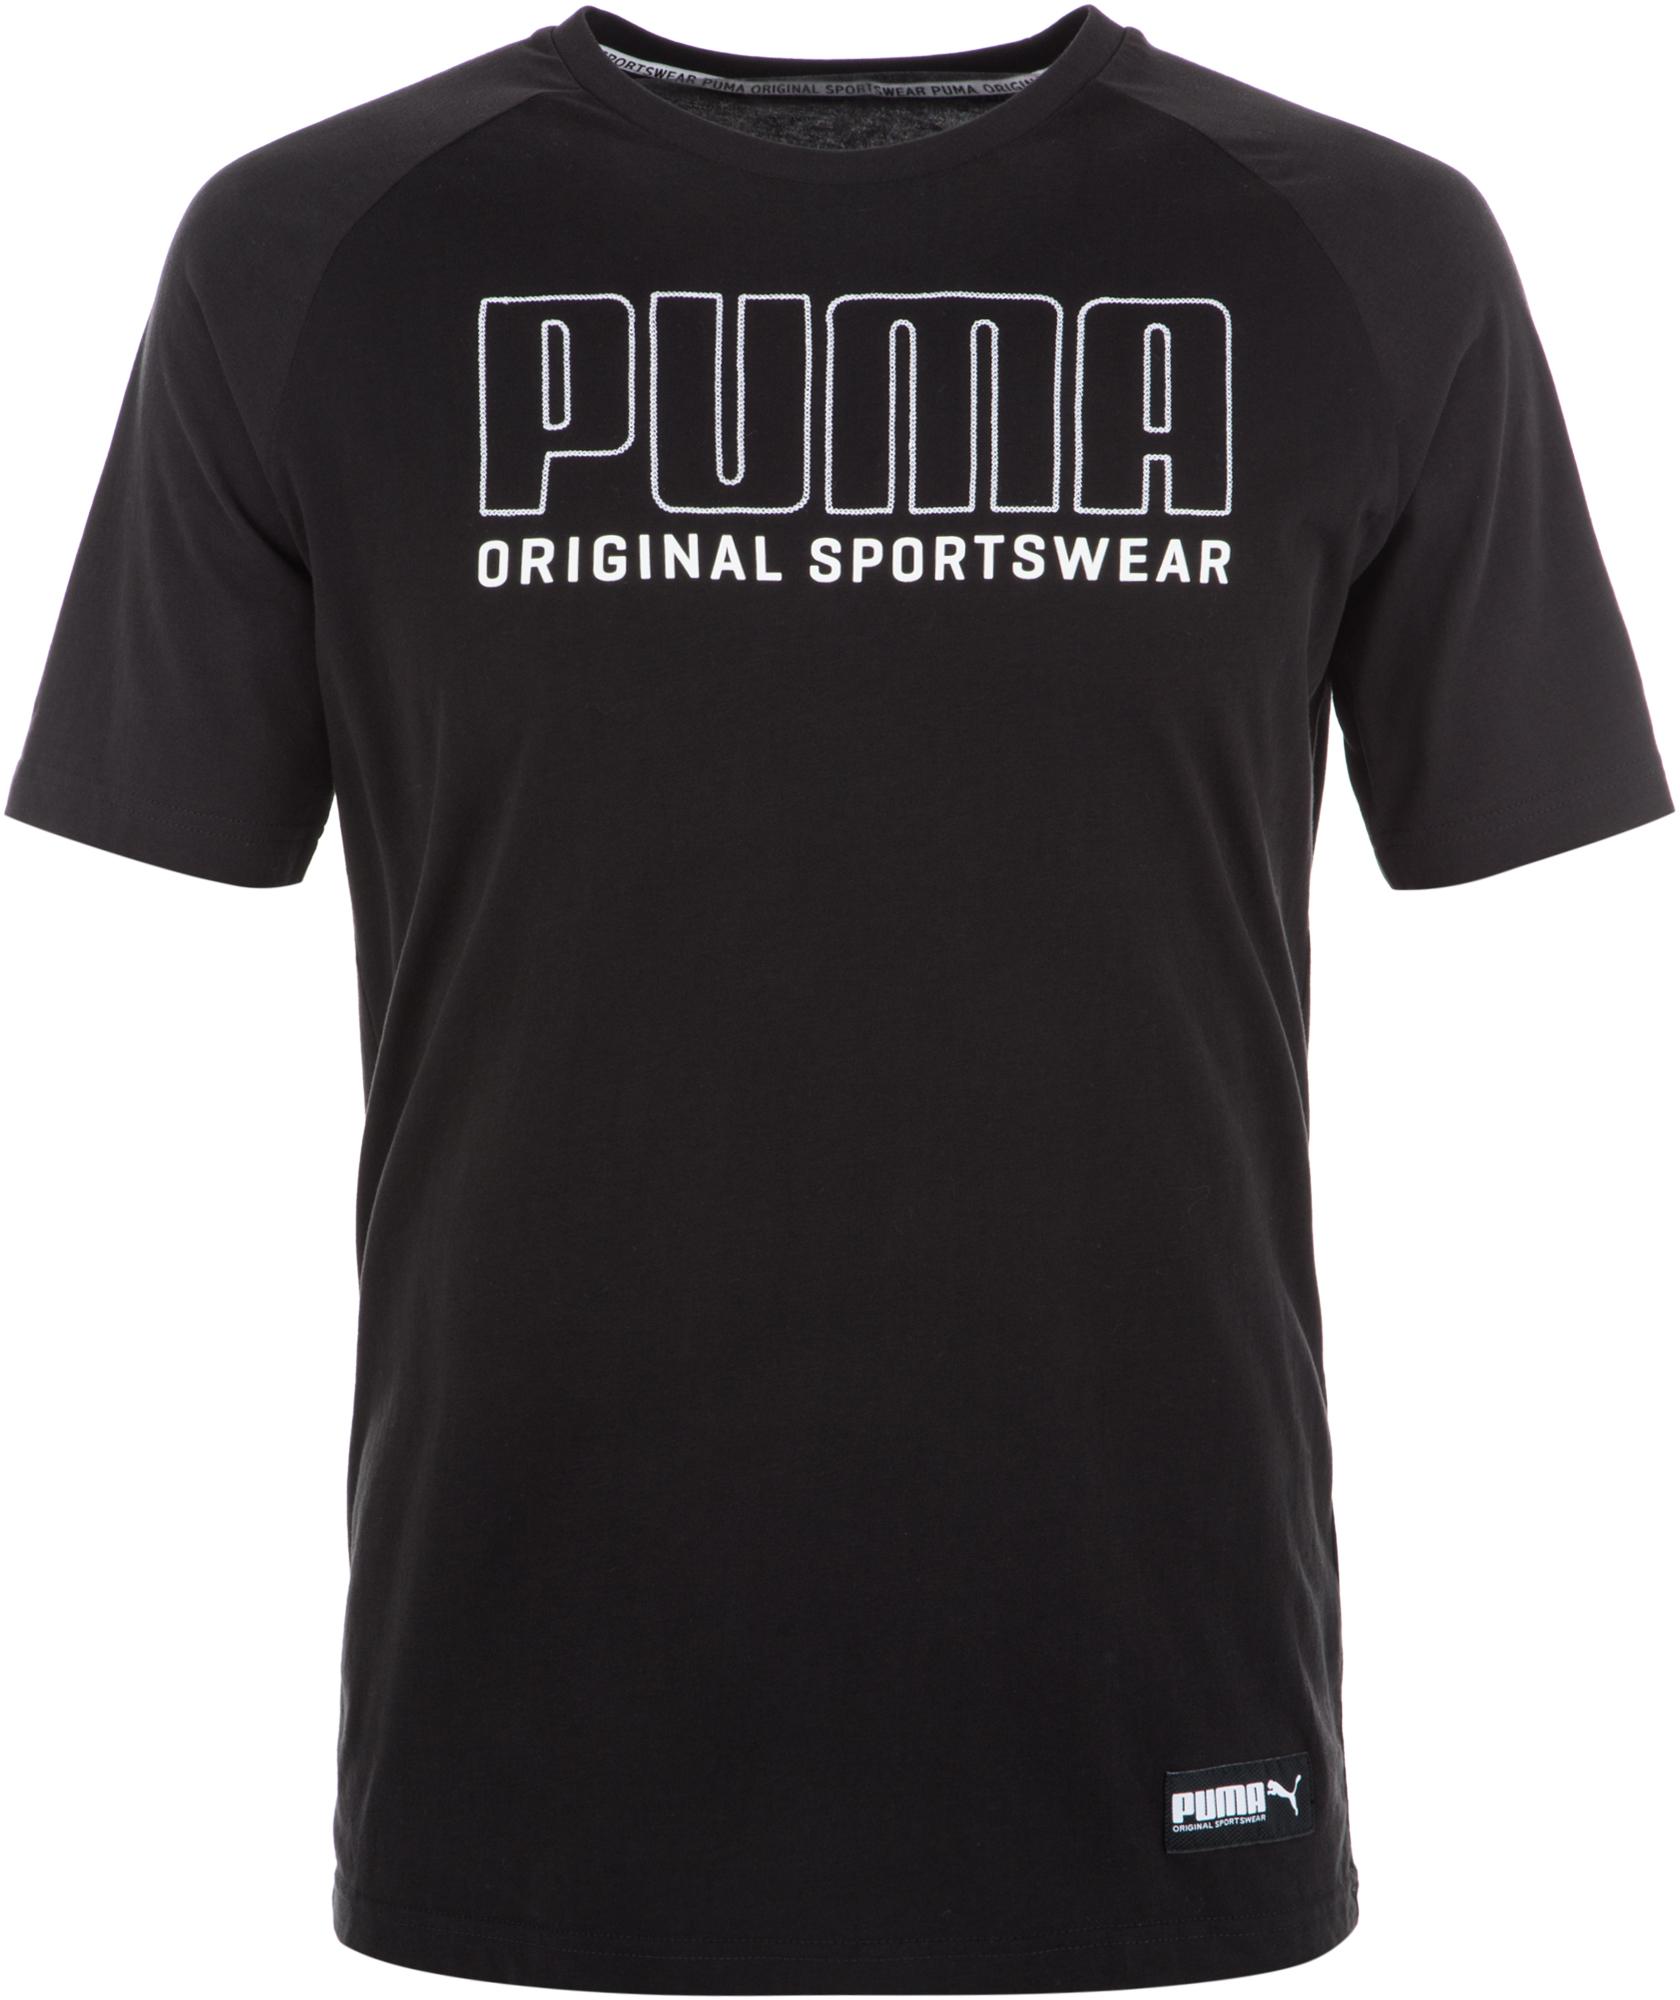 Puma Футболка мужская Puma Athletics, размер 50-52 цена 2017